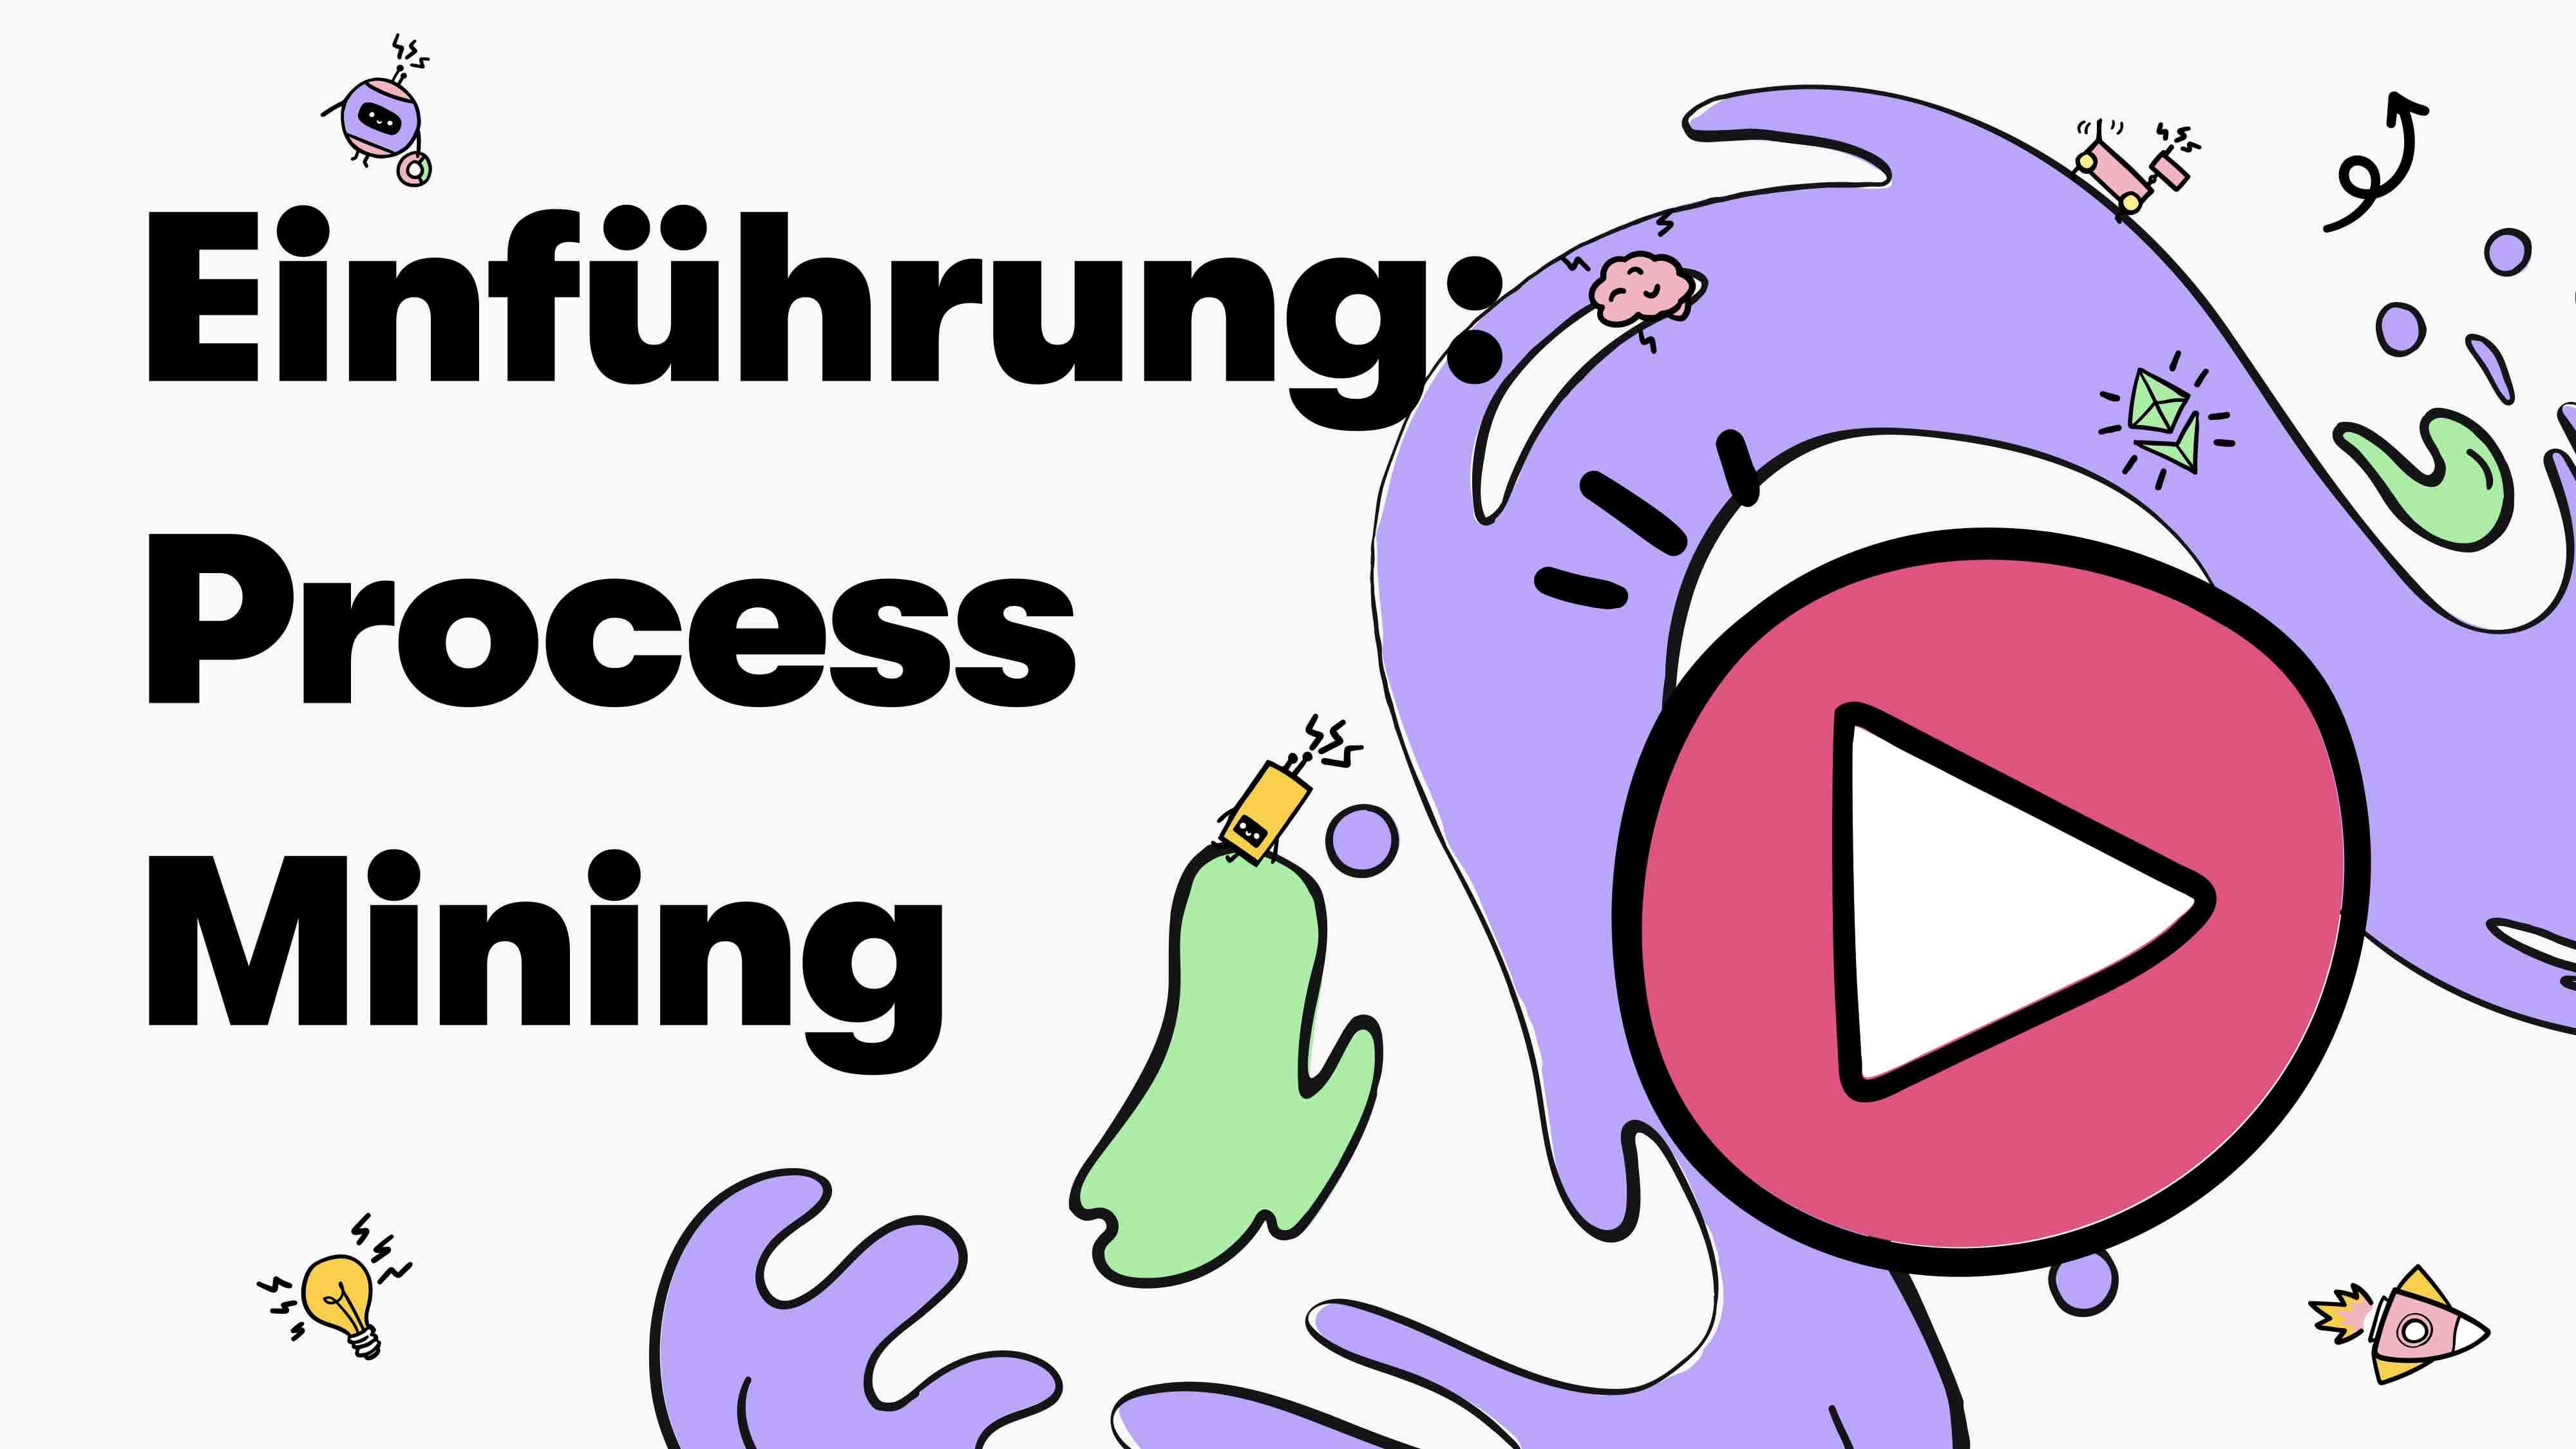 Einführung Process Mining